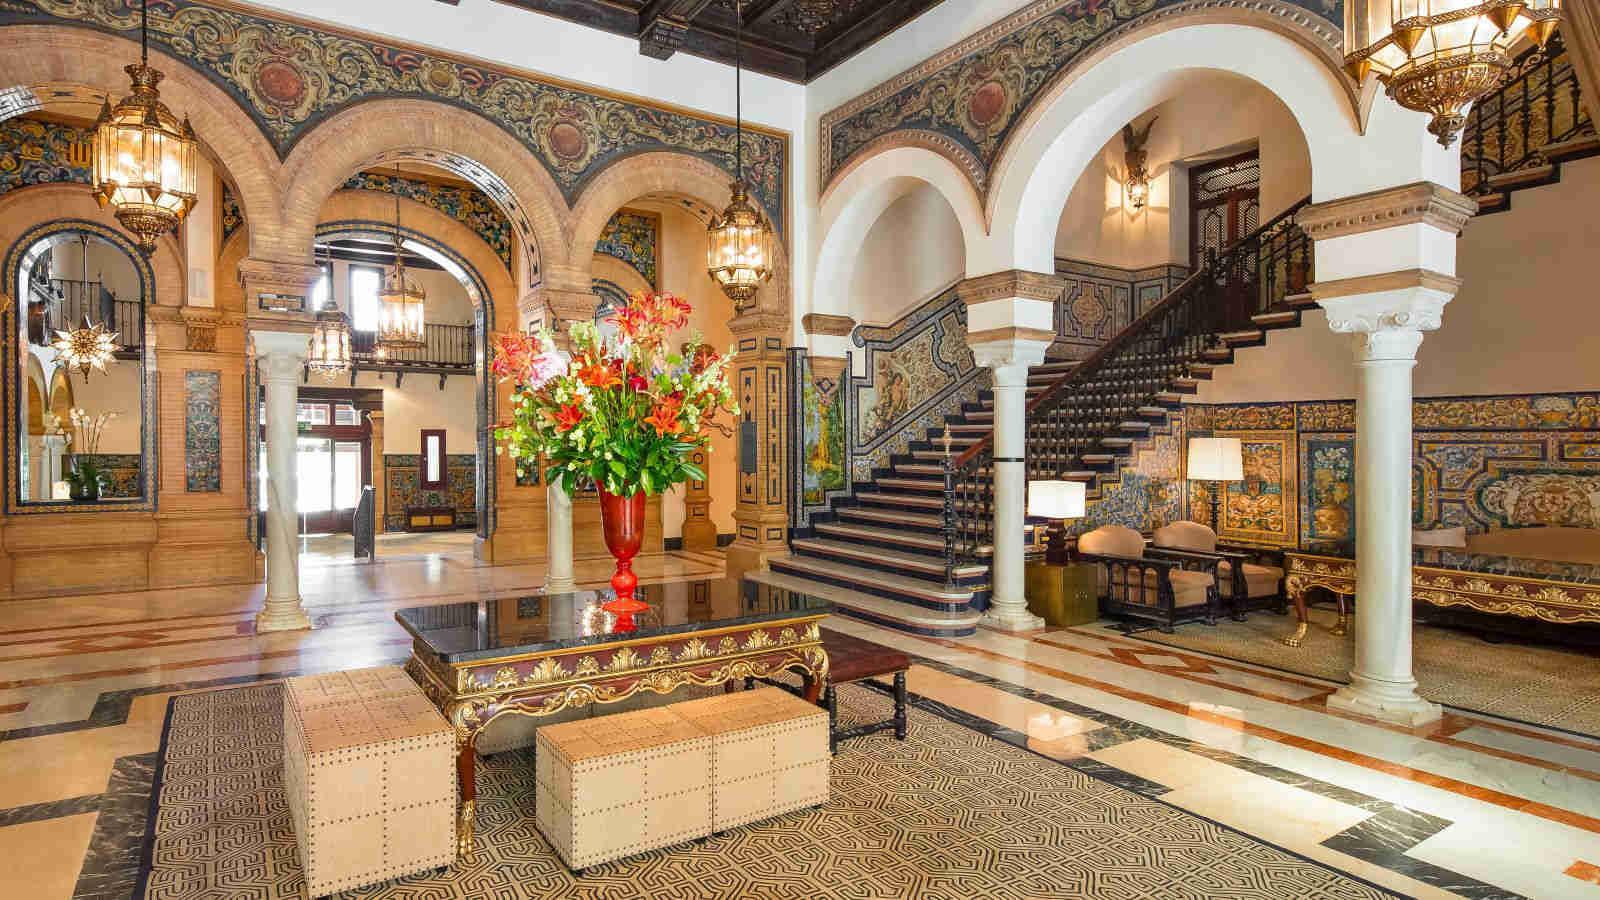 Hotel alfonso xiii haute grandeur for Hotel design seville